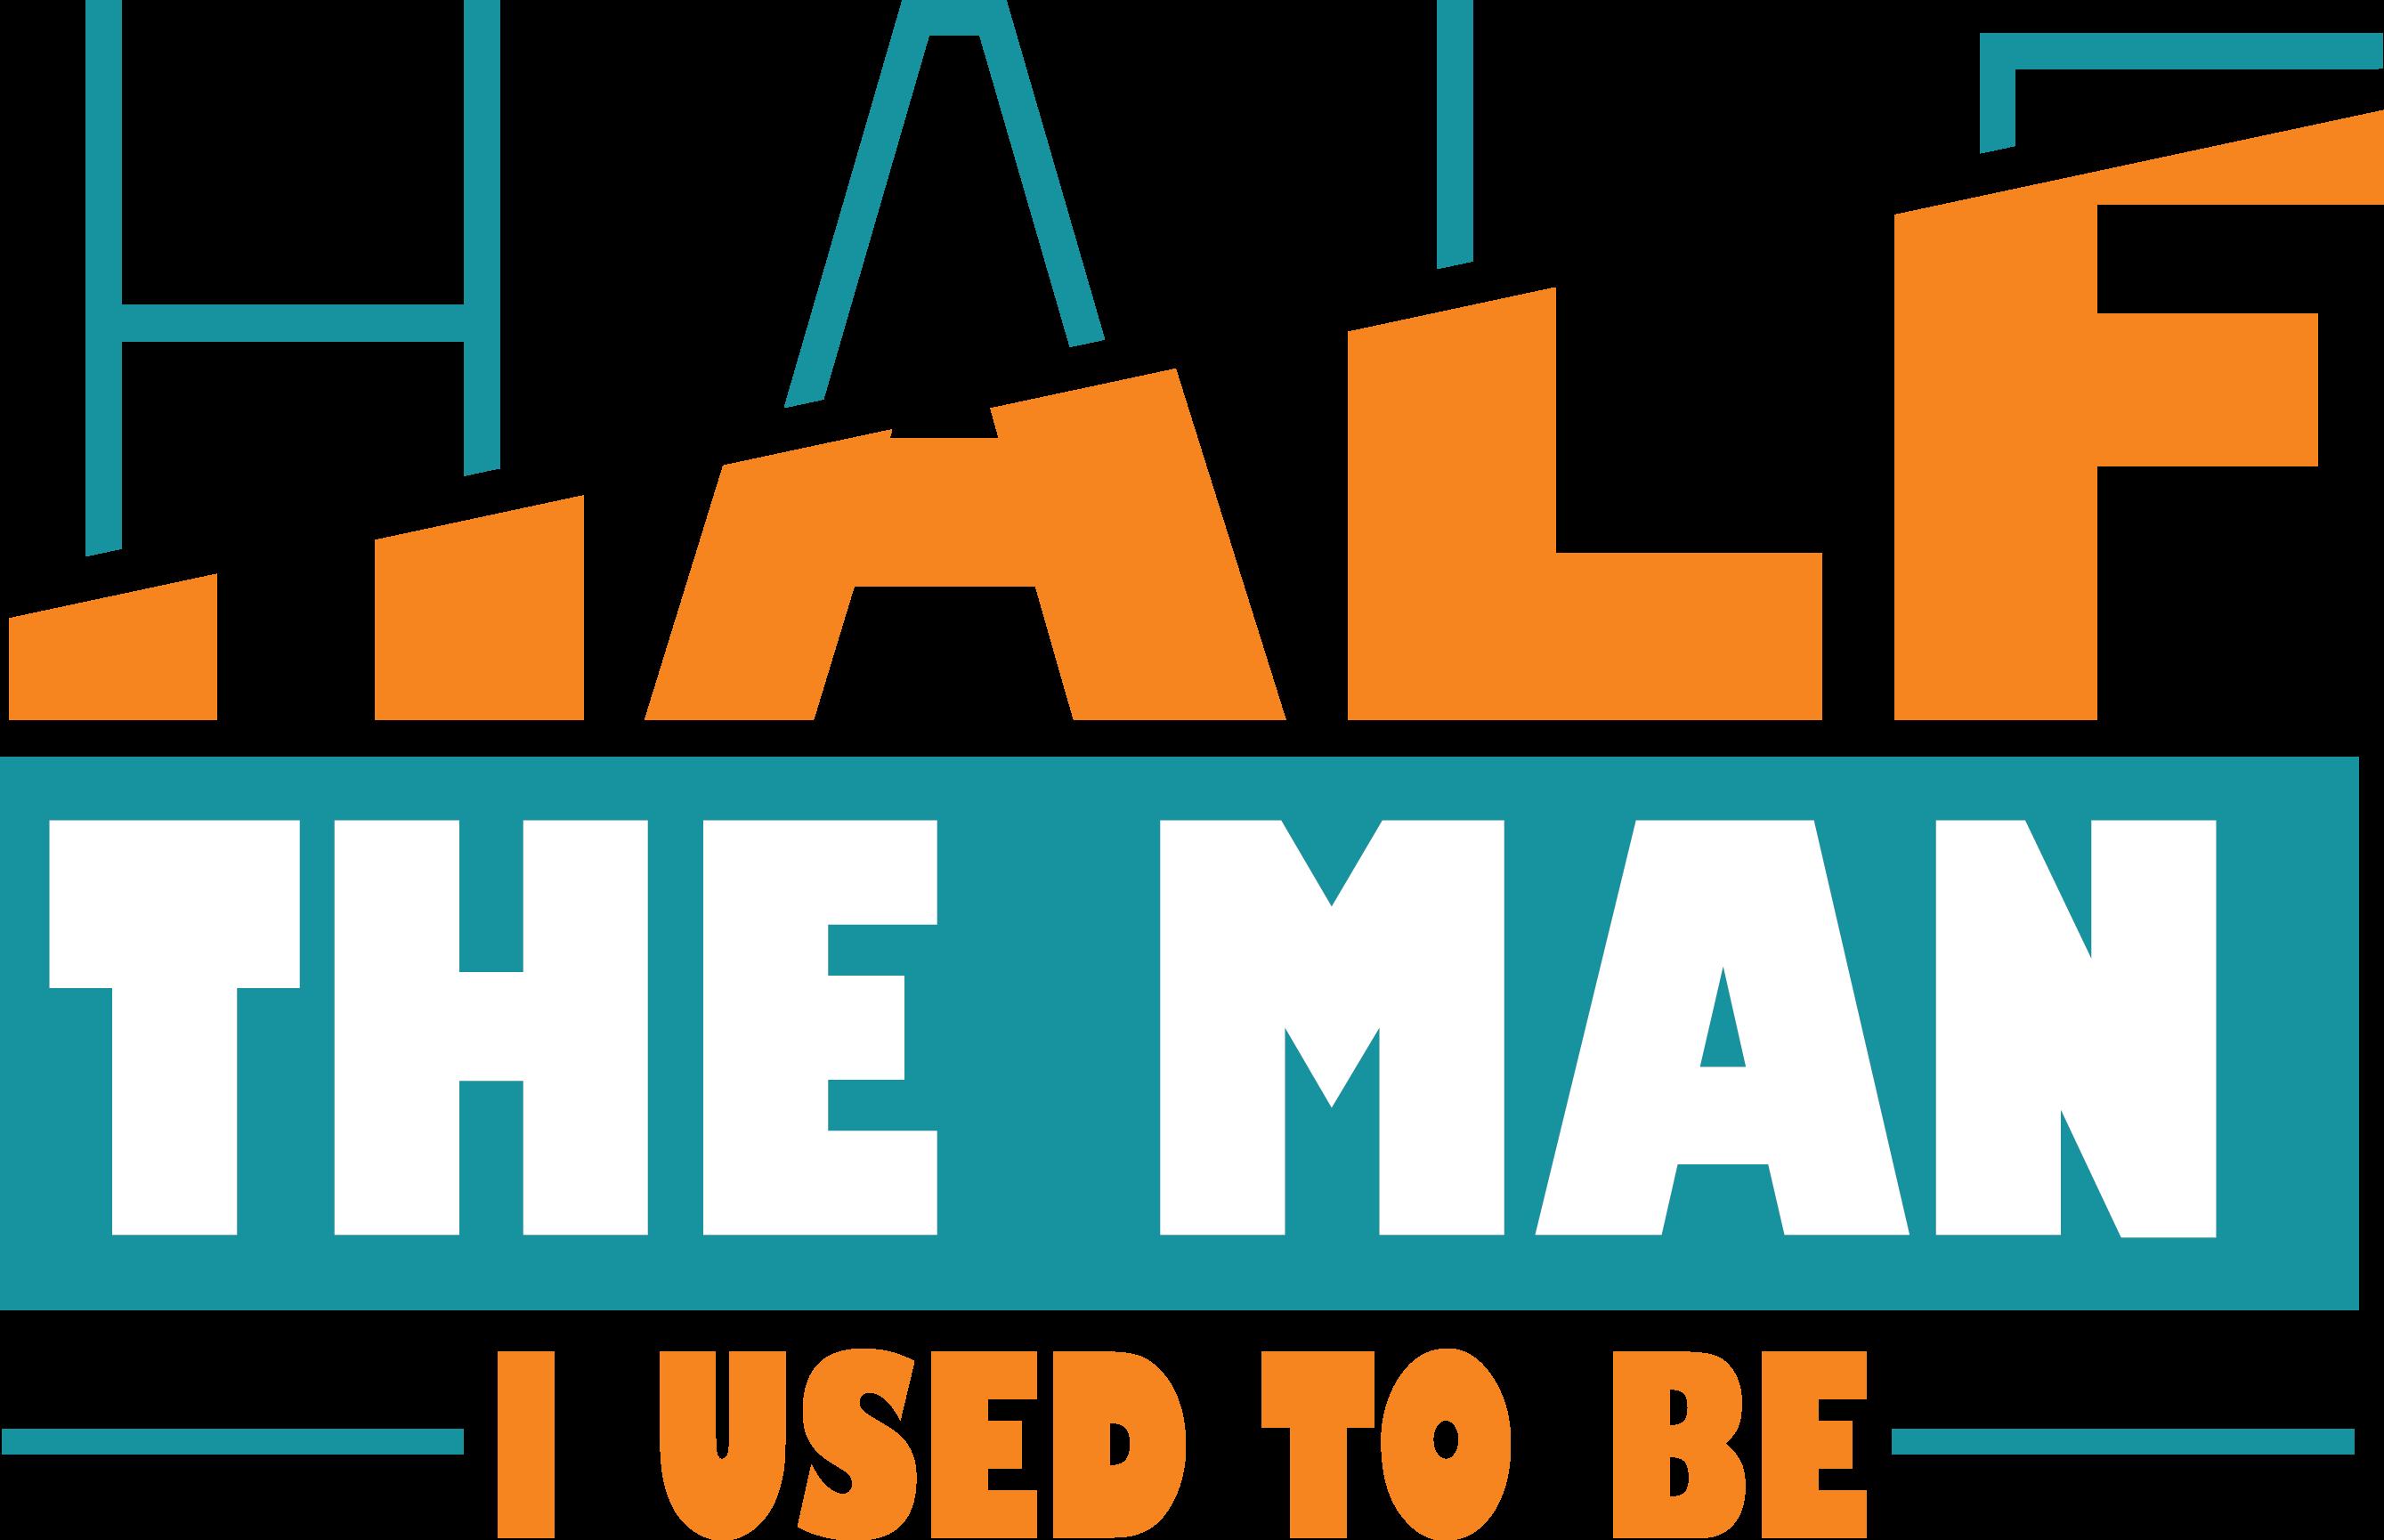 Half The Man